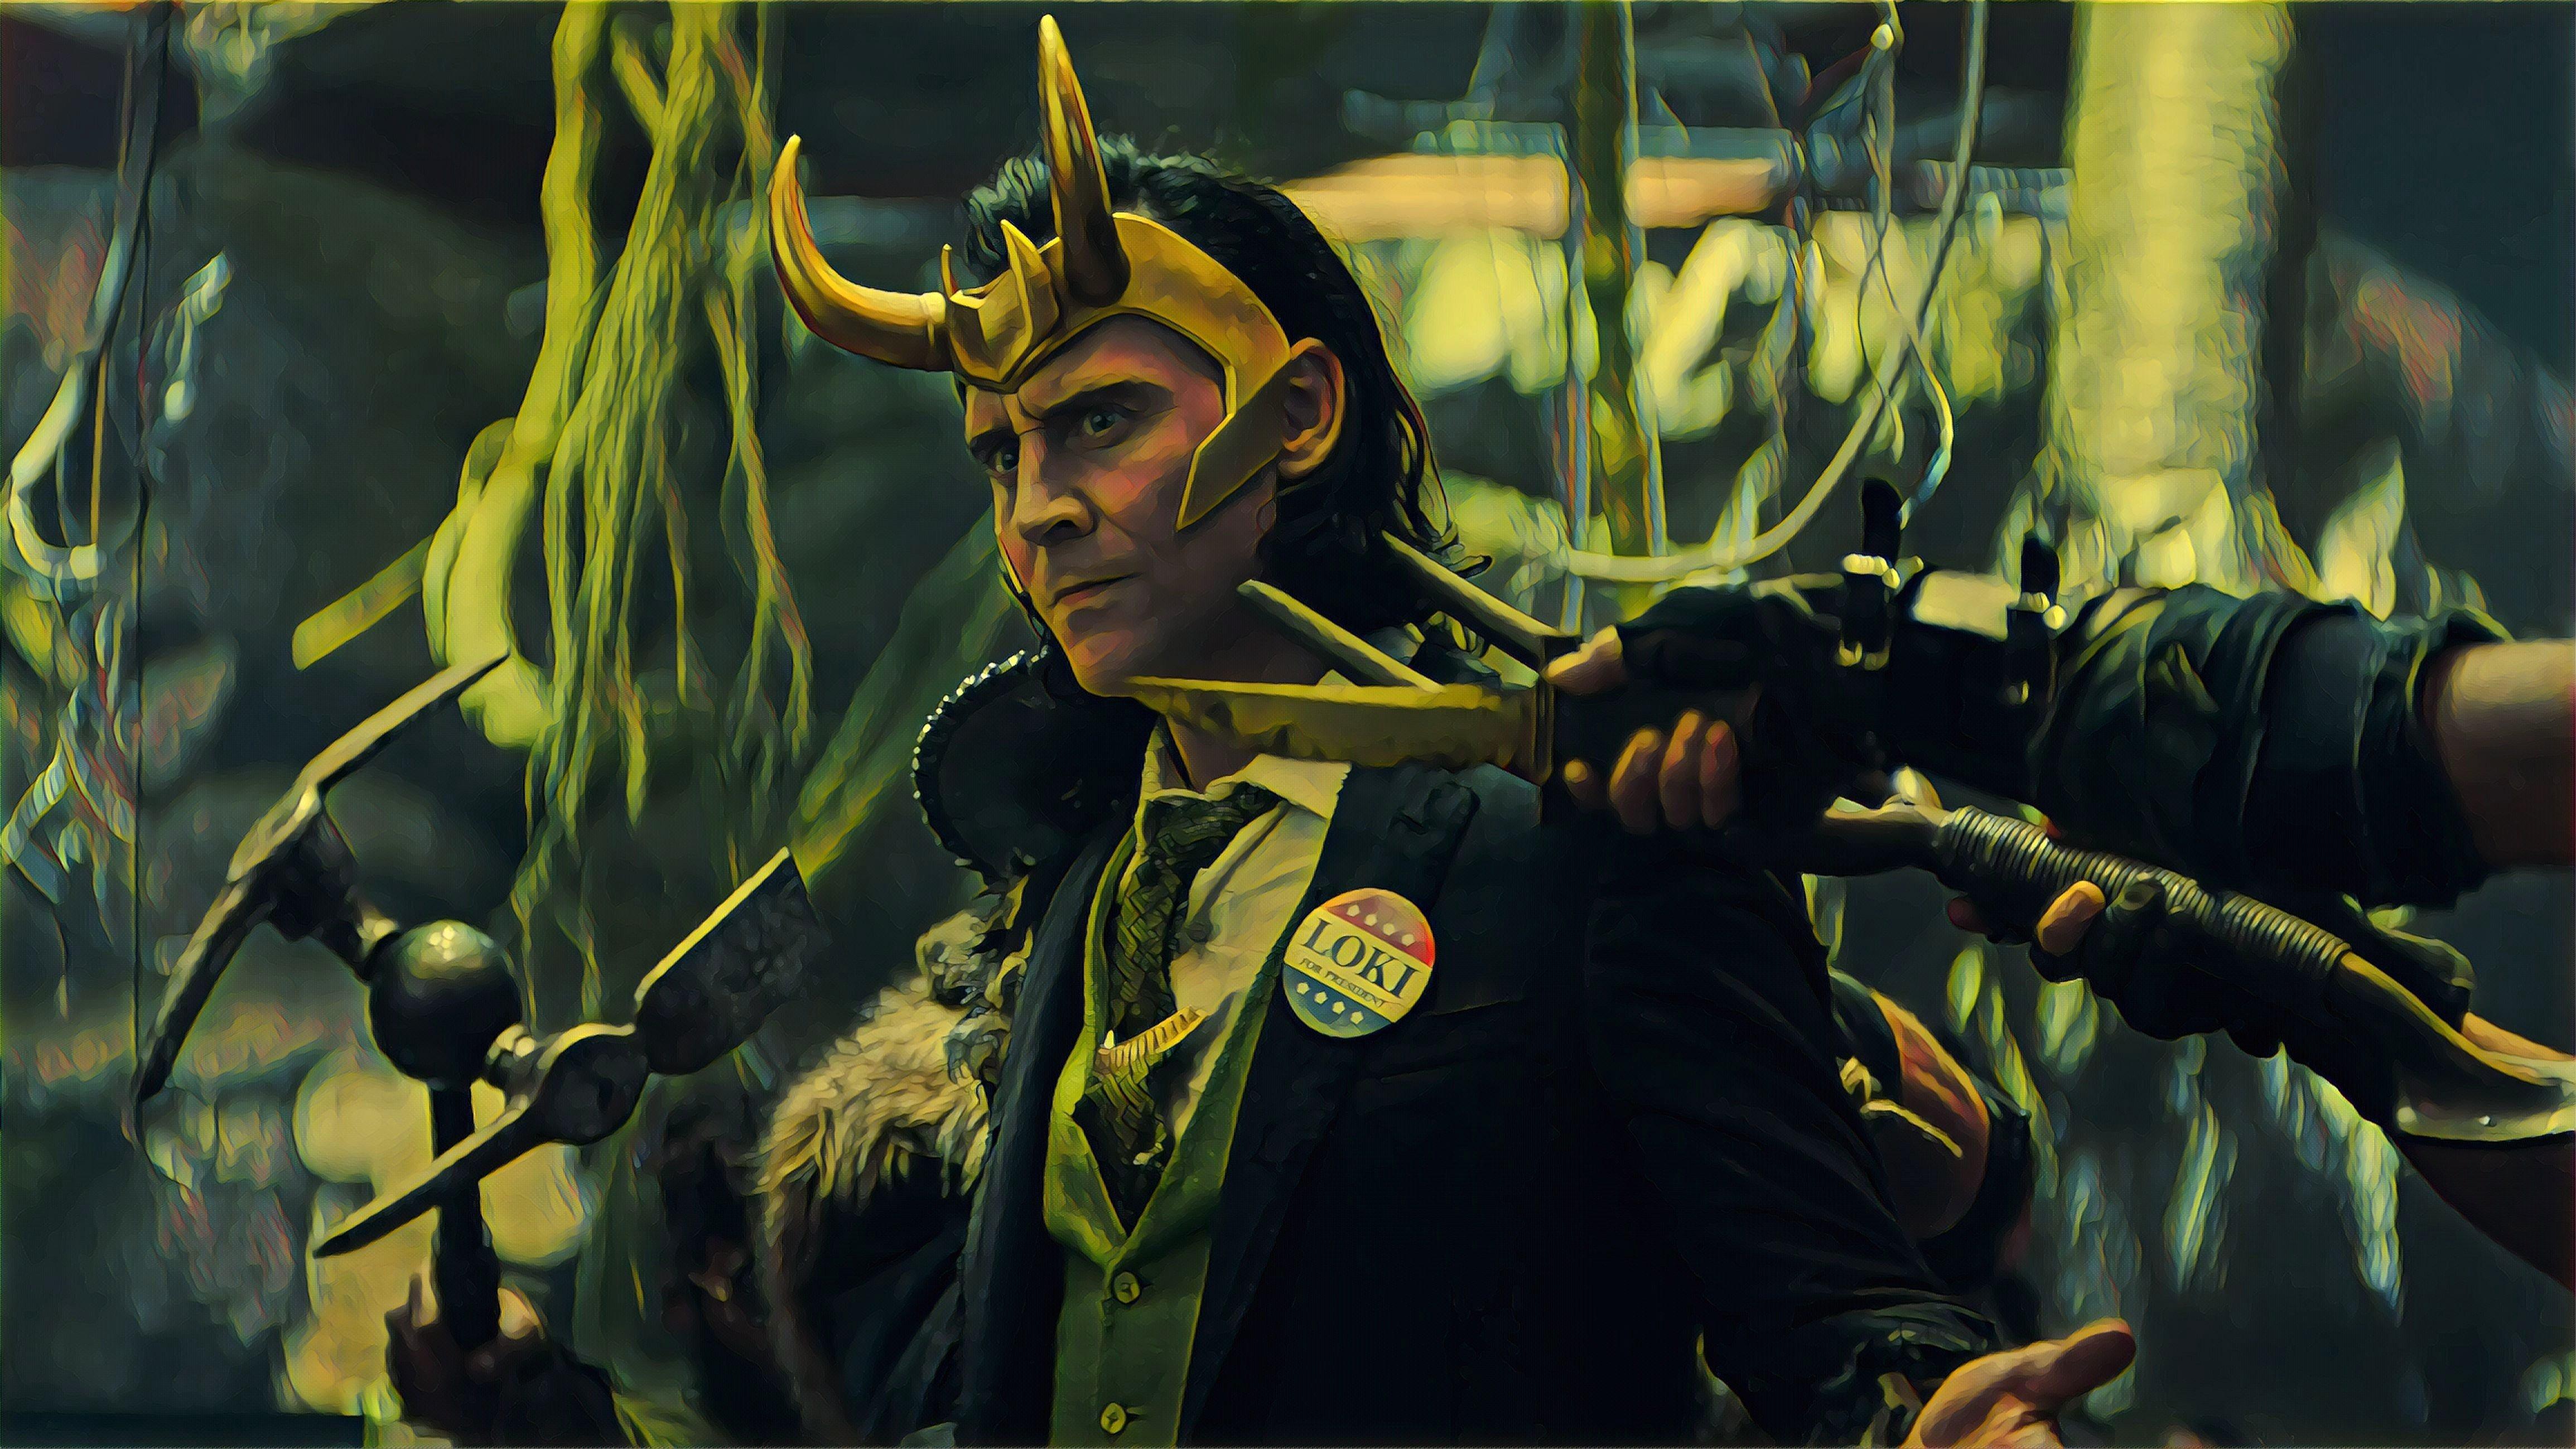 Wallpaper Loki 2021